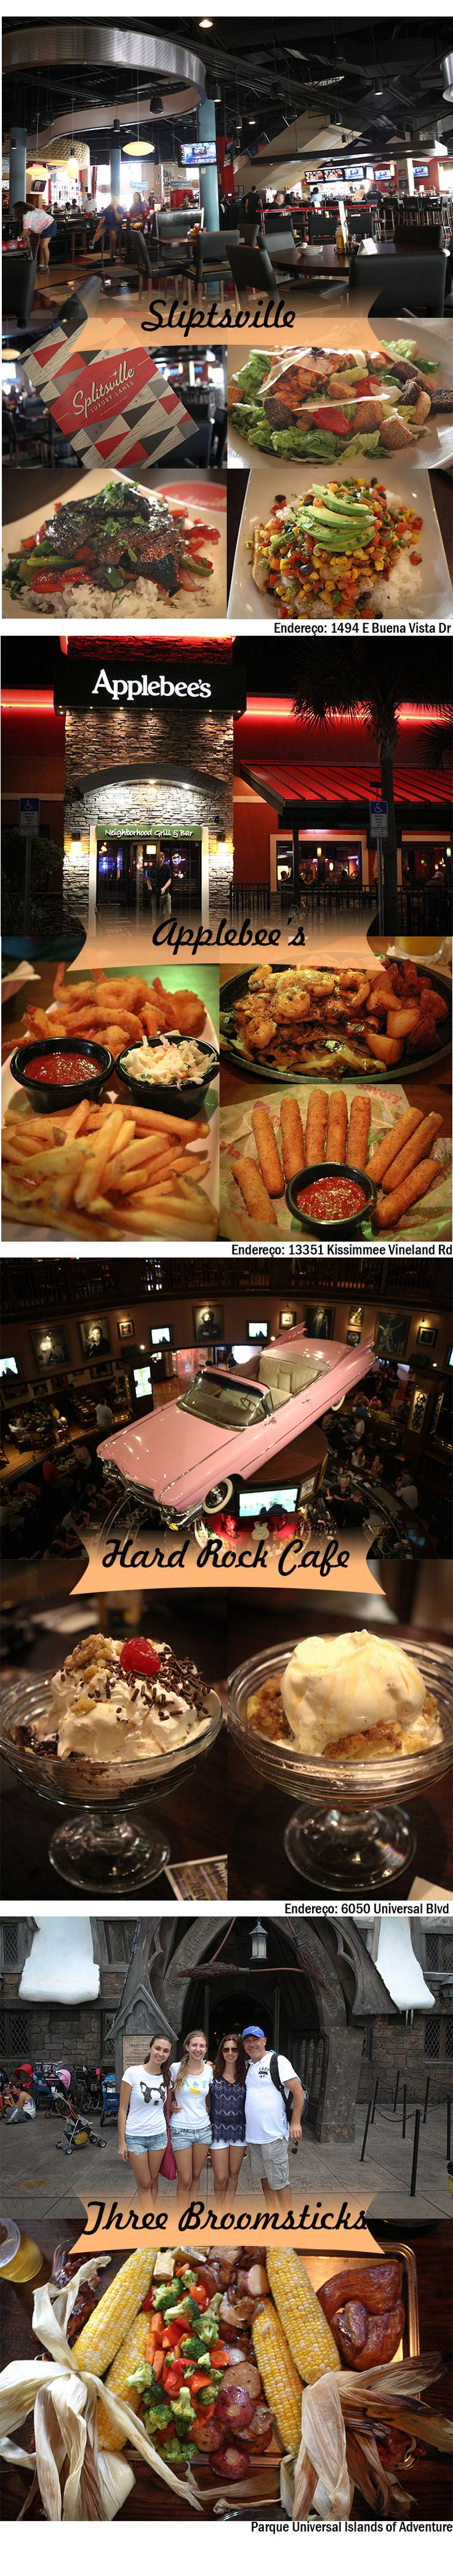 Tip | Restaurants | Food | Orlando | Miami | Shrimp | Florida | United States | Bubba Gump | Hard Rock | Three Broomsticks | The Cheesecake Factory | Splitsville | Applebee's | Bellini | Ocean Drive | Beach